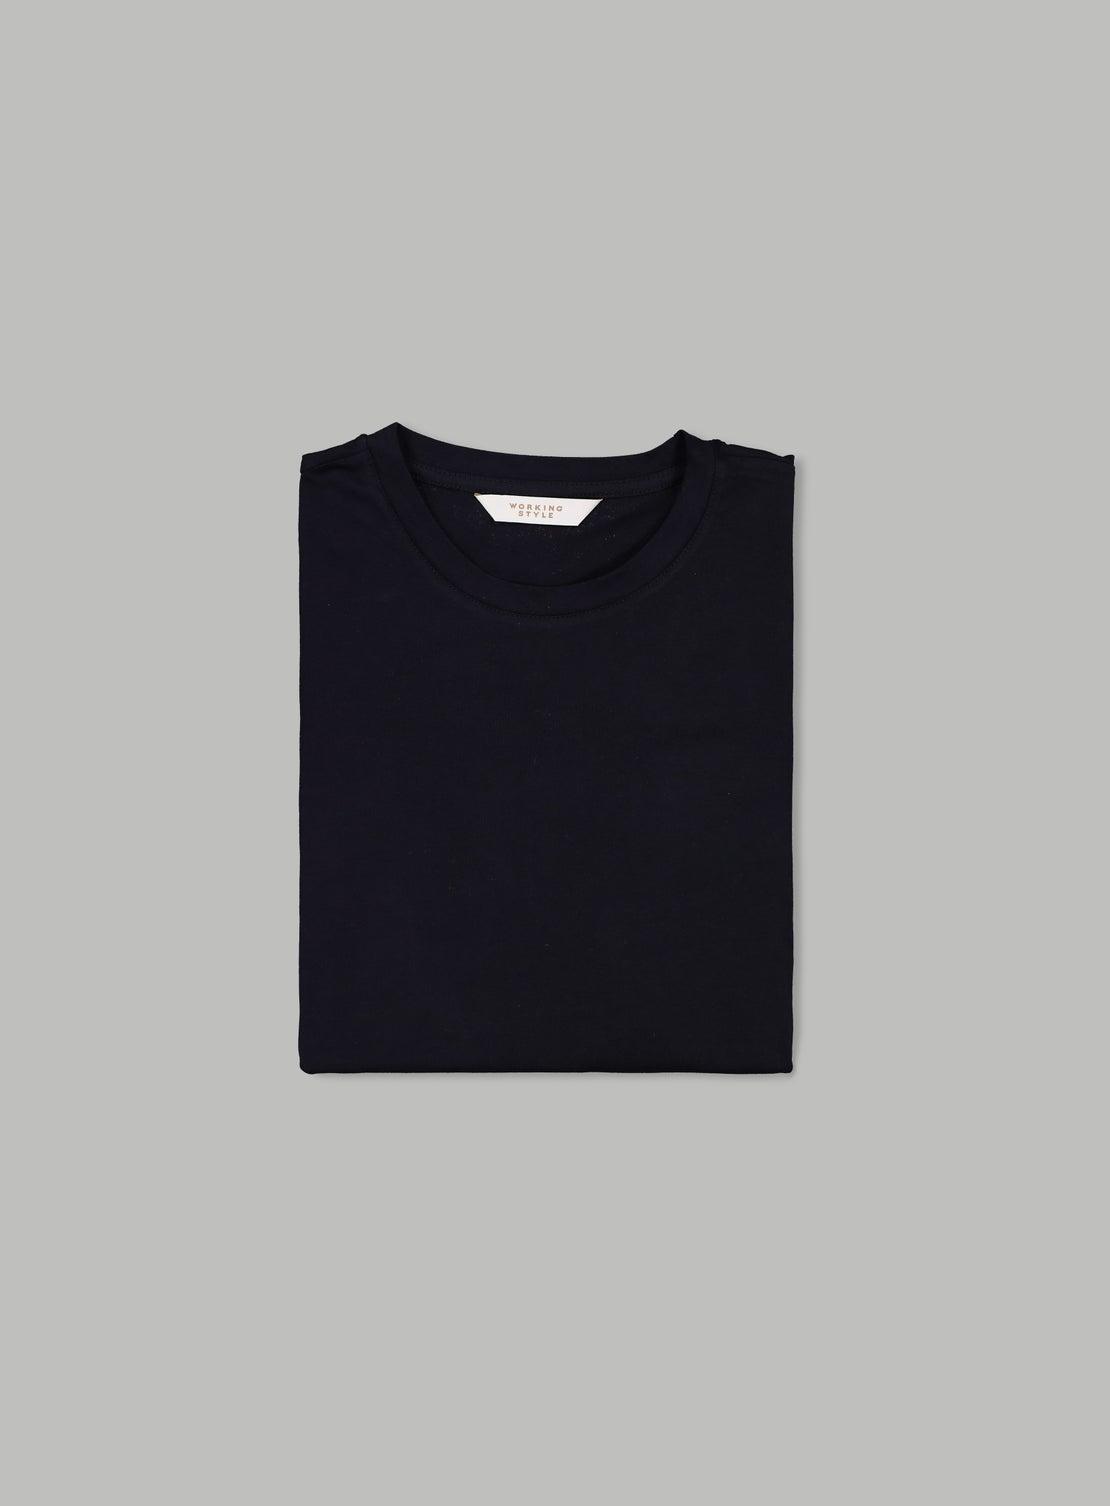 Benny Navy T-Shirt